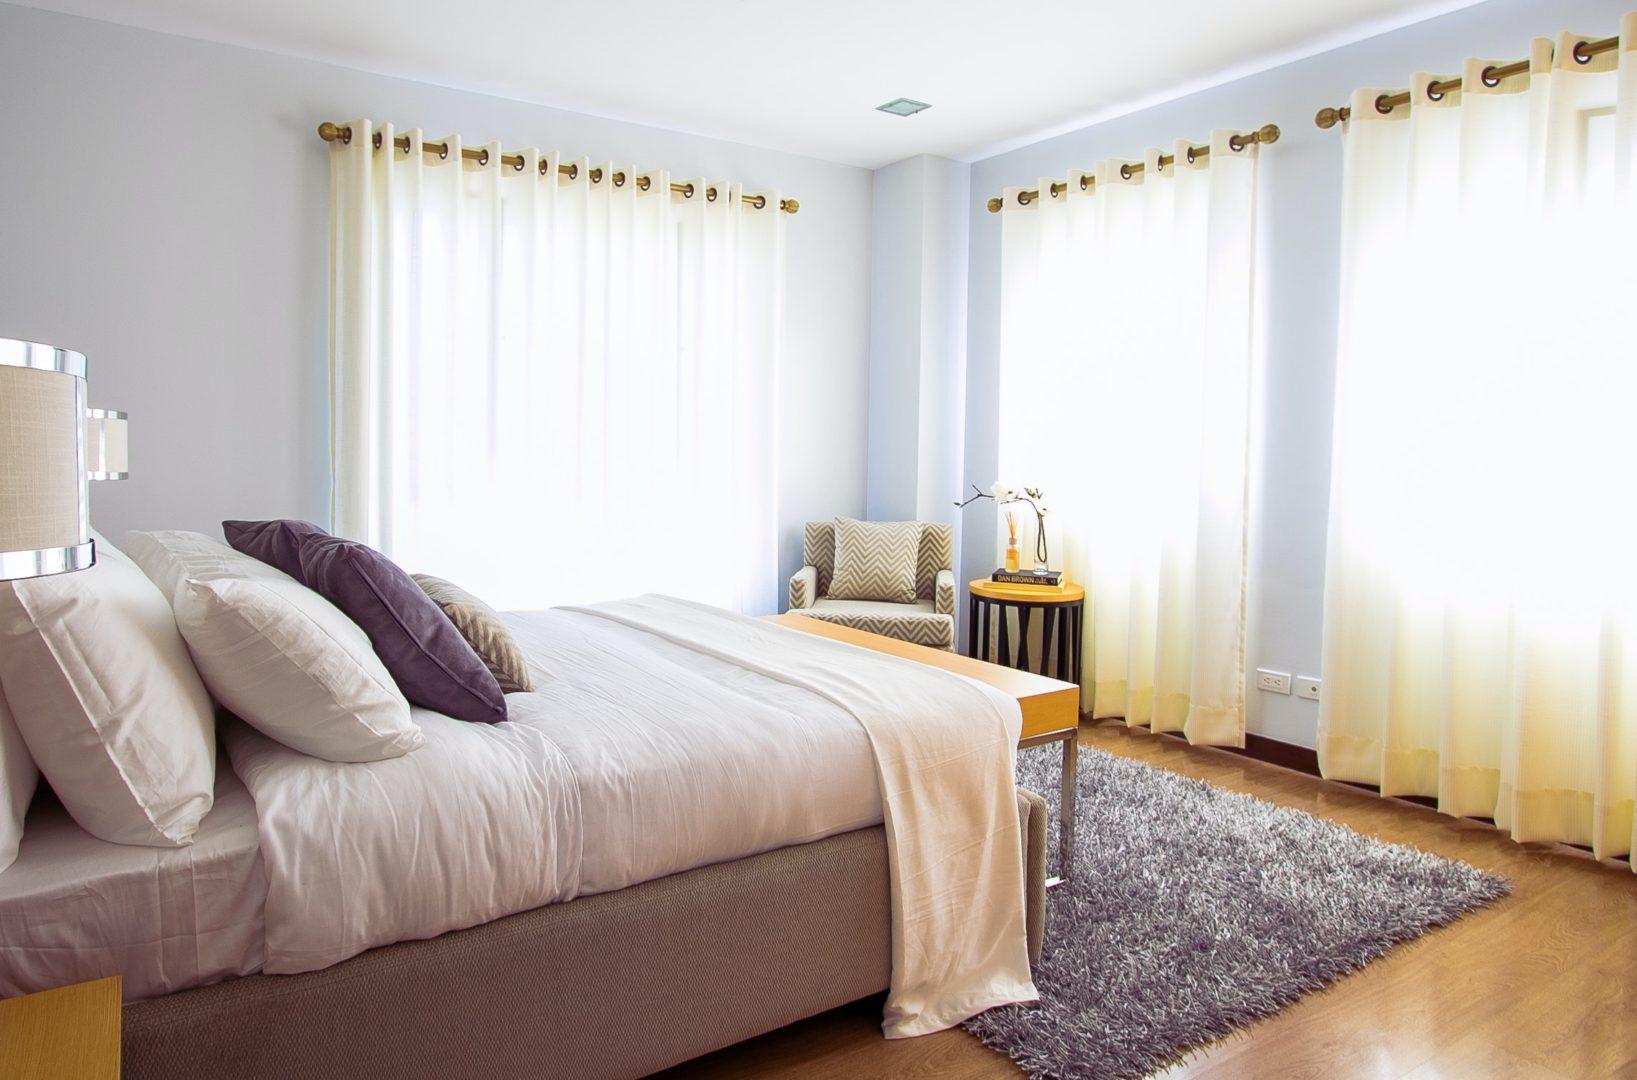 white bed comforter during daytimne 90317 - Chambre d'Hôtes Référence®